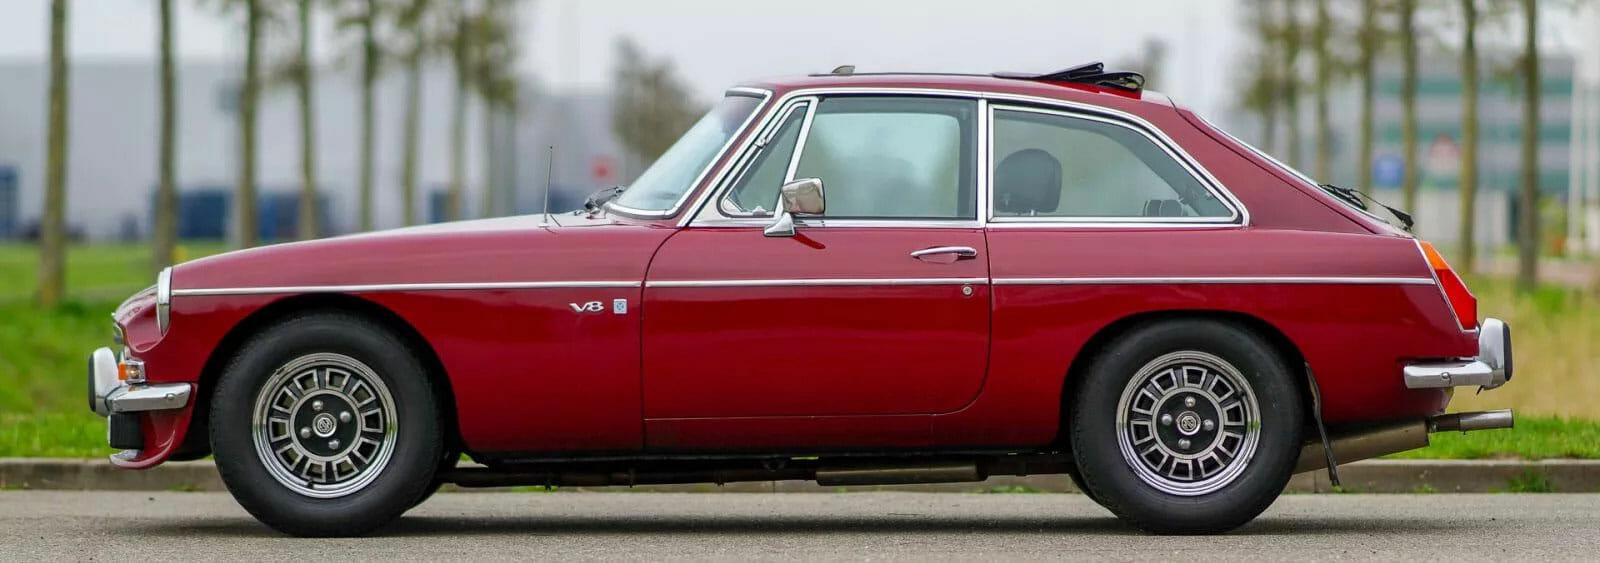 Leacy Classic MGB GT red